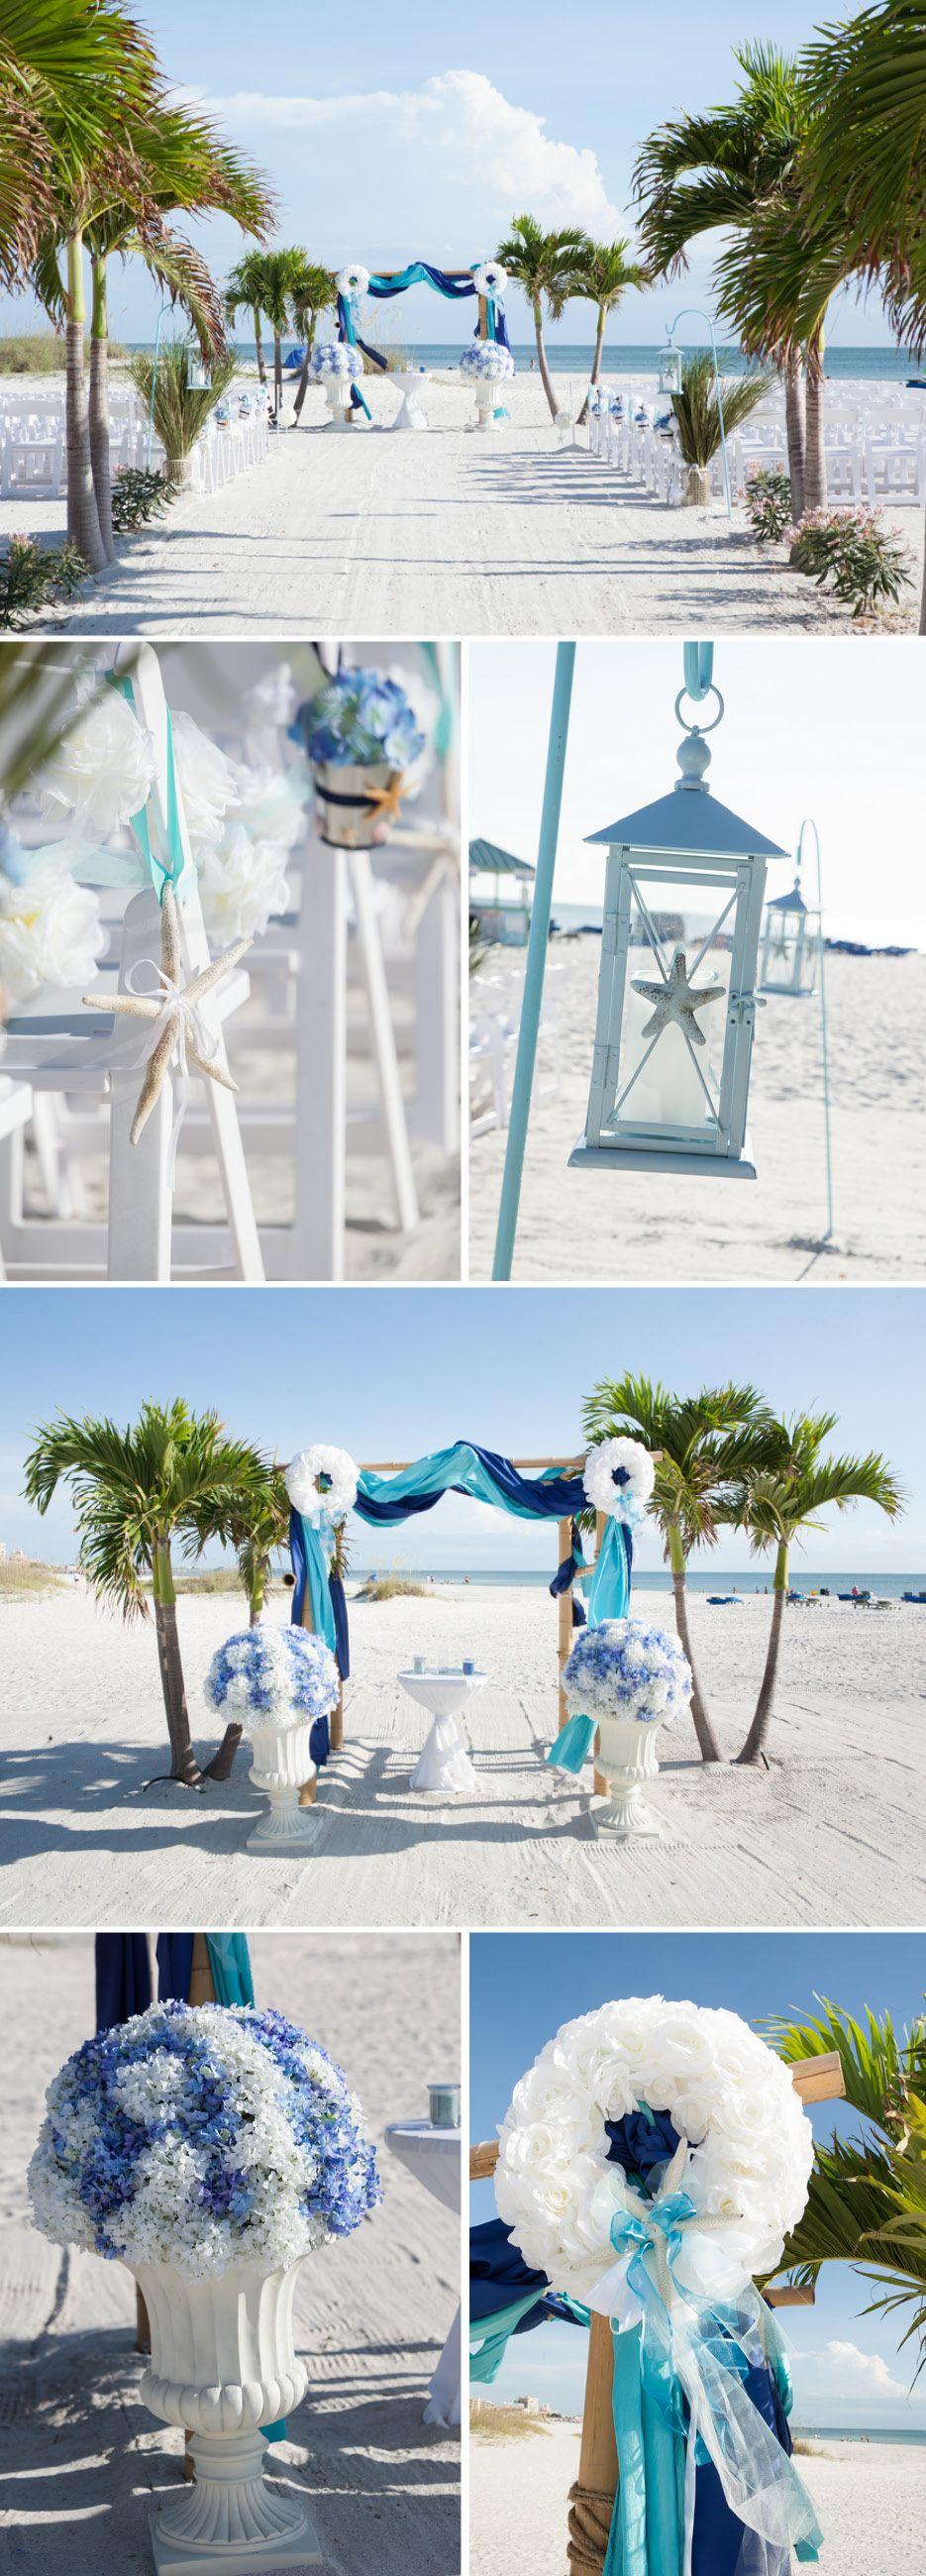 St. Petersburg Beach Wedding at The Grand Plaza Hotel